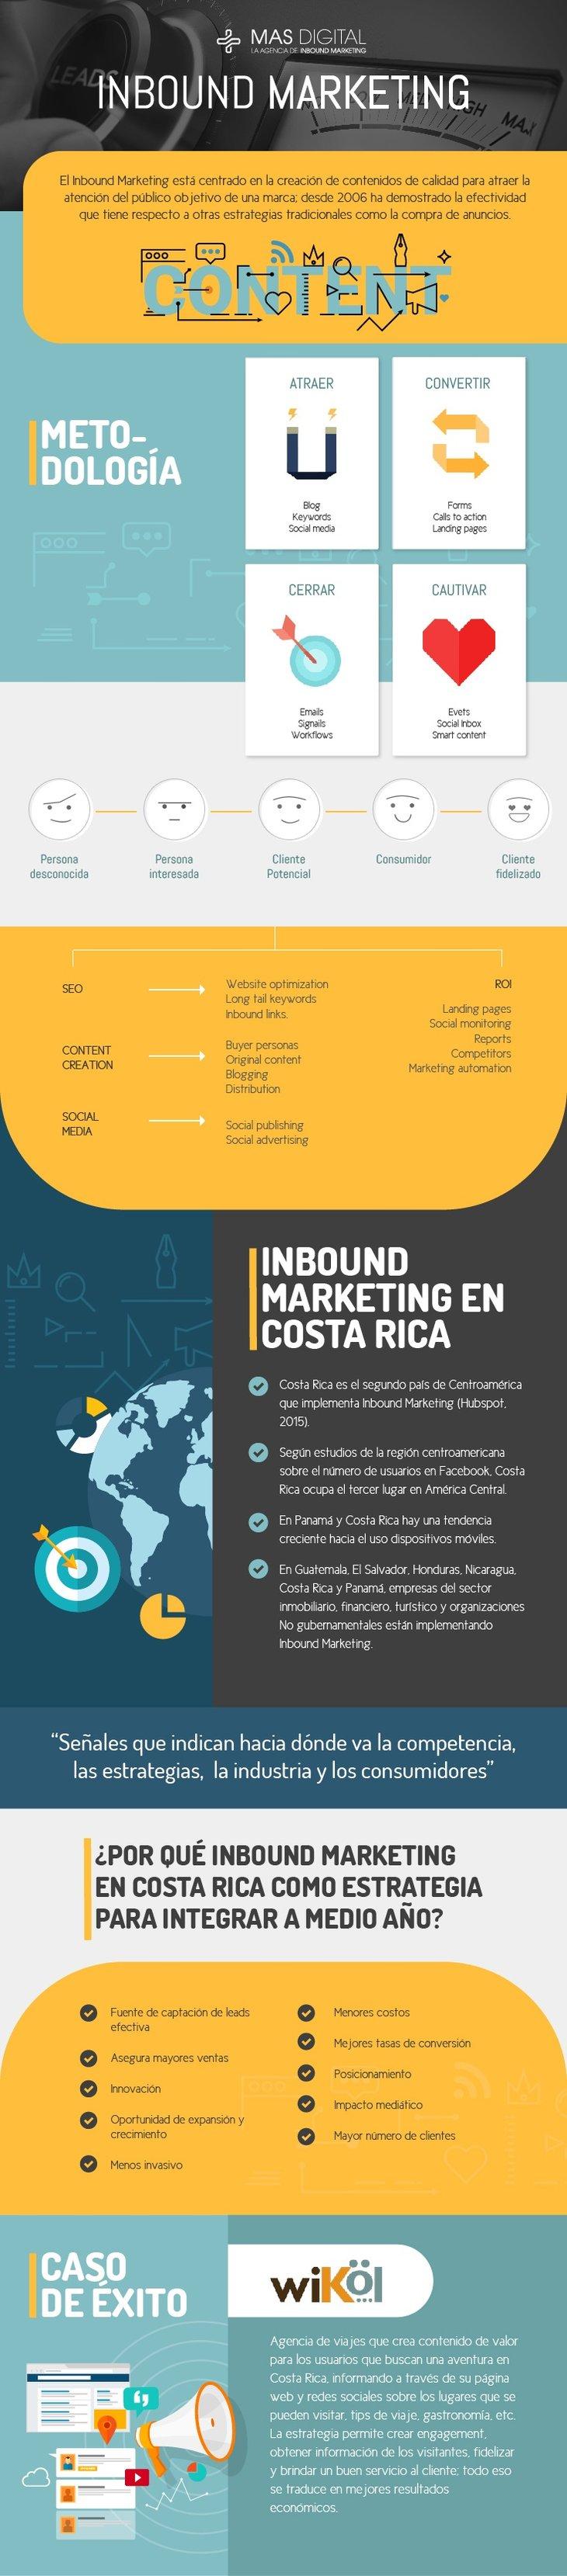 Inbound Marketing en Costa Rica como estrategia para integrar a medio ano.jpg